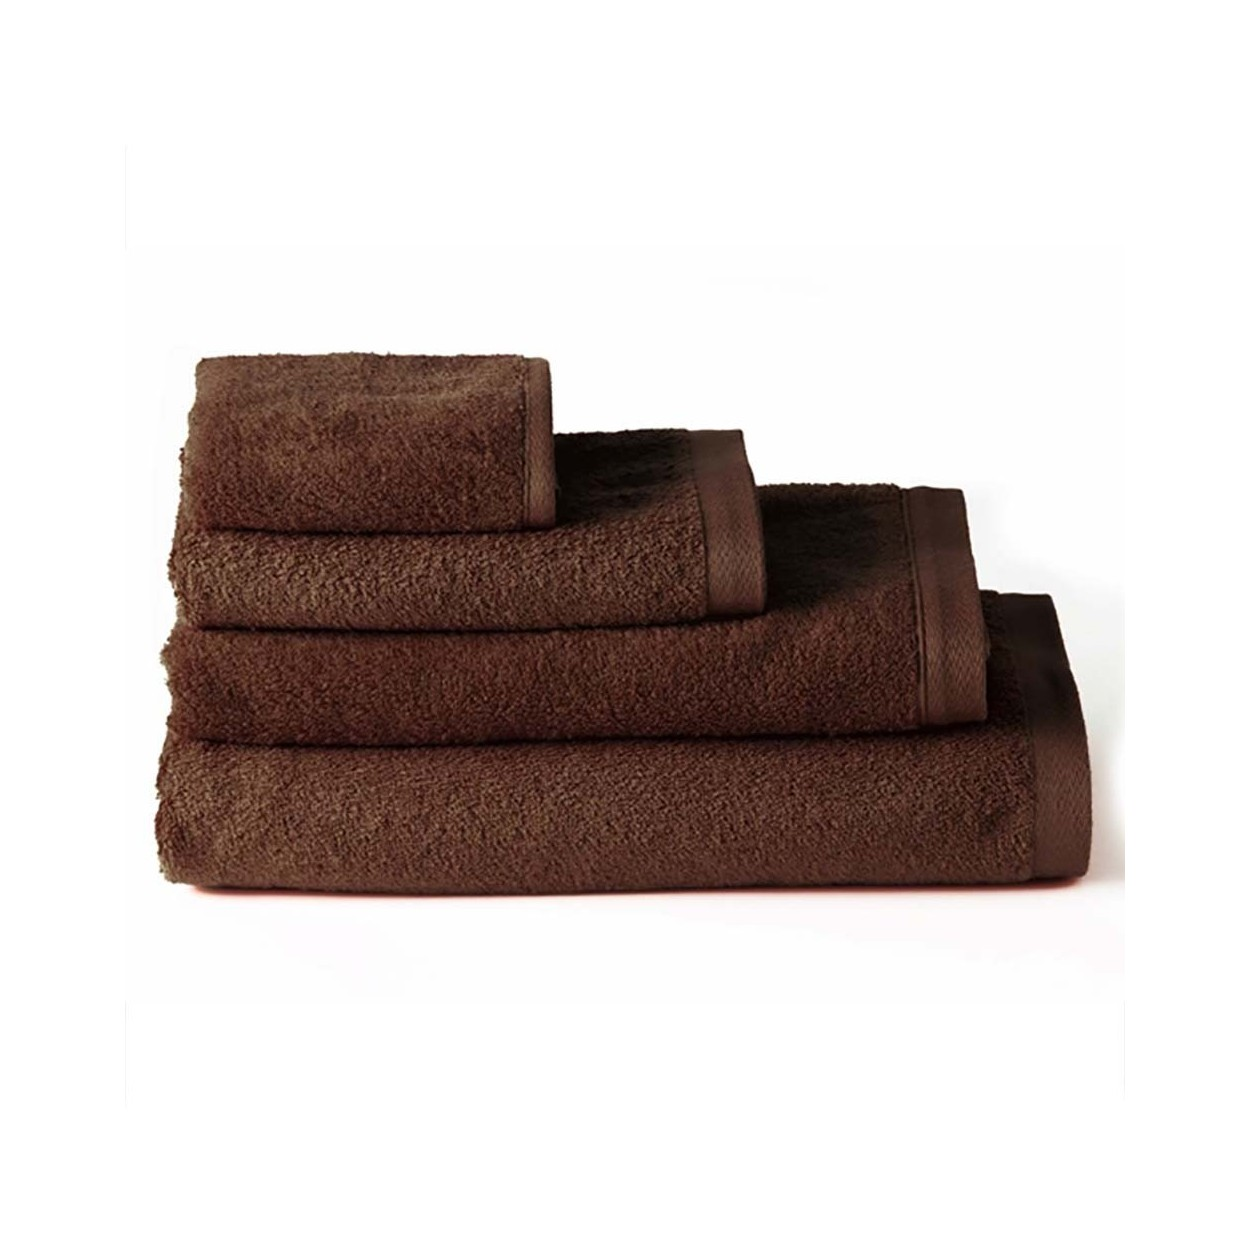 Toalla de ba o tocador algod n marr n chocolate 30x50 hogar y m s - Toallas para bano ...